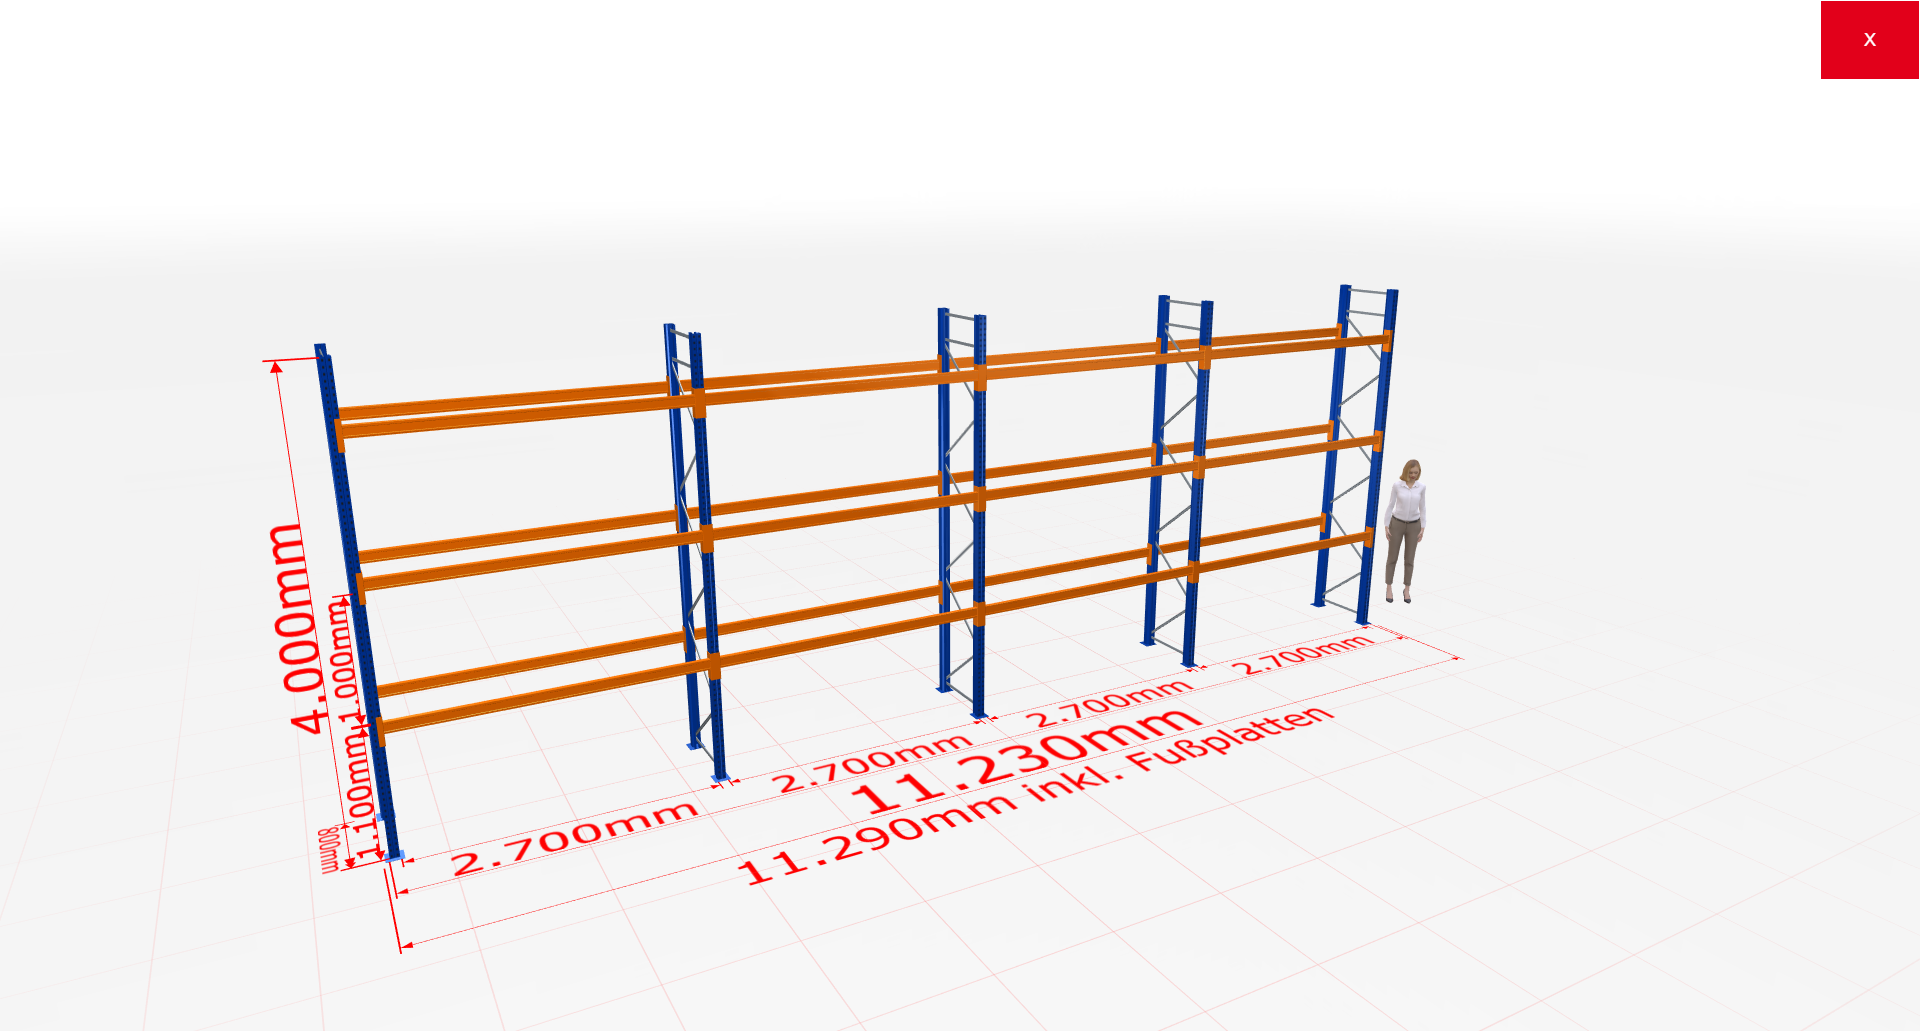 Palettenregal Komplettregal 4000x11230x800 mm (HxBxT) 3 Fachebenen SCHULTE Lagertechnik